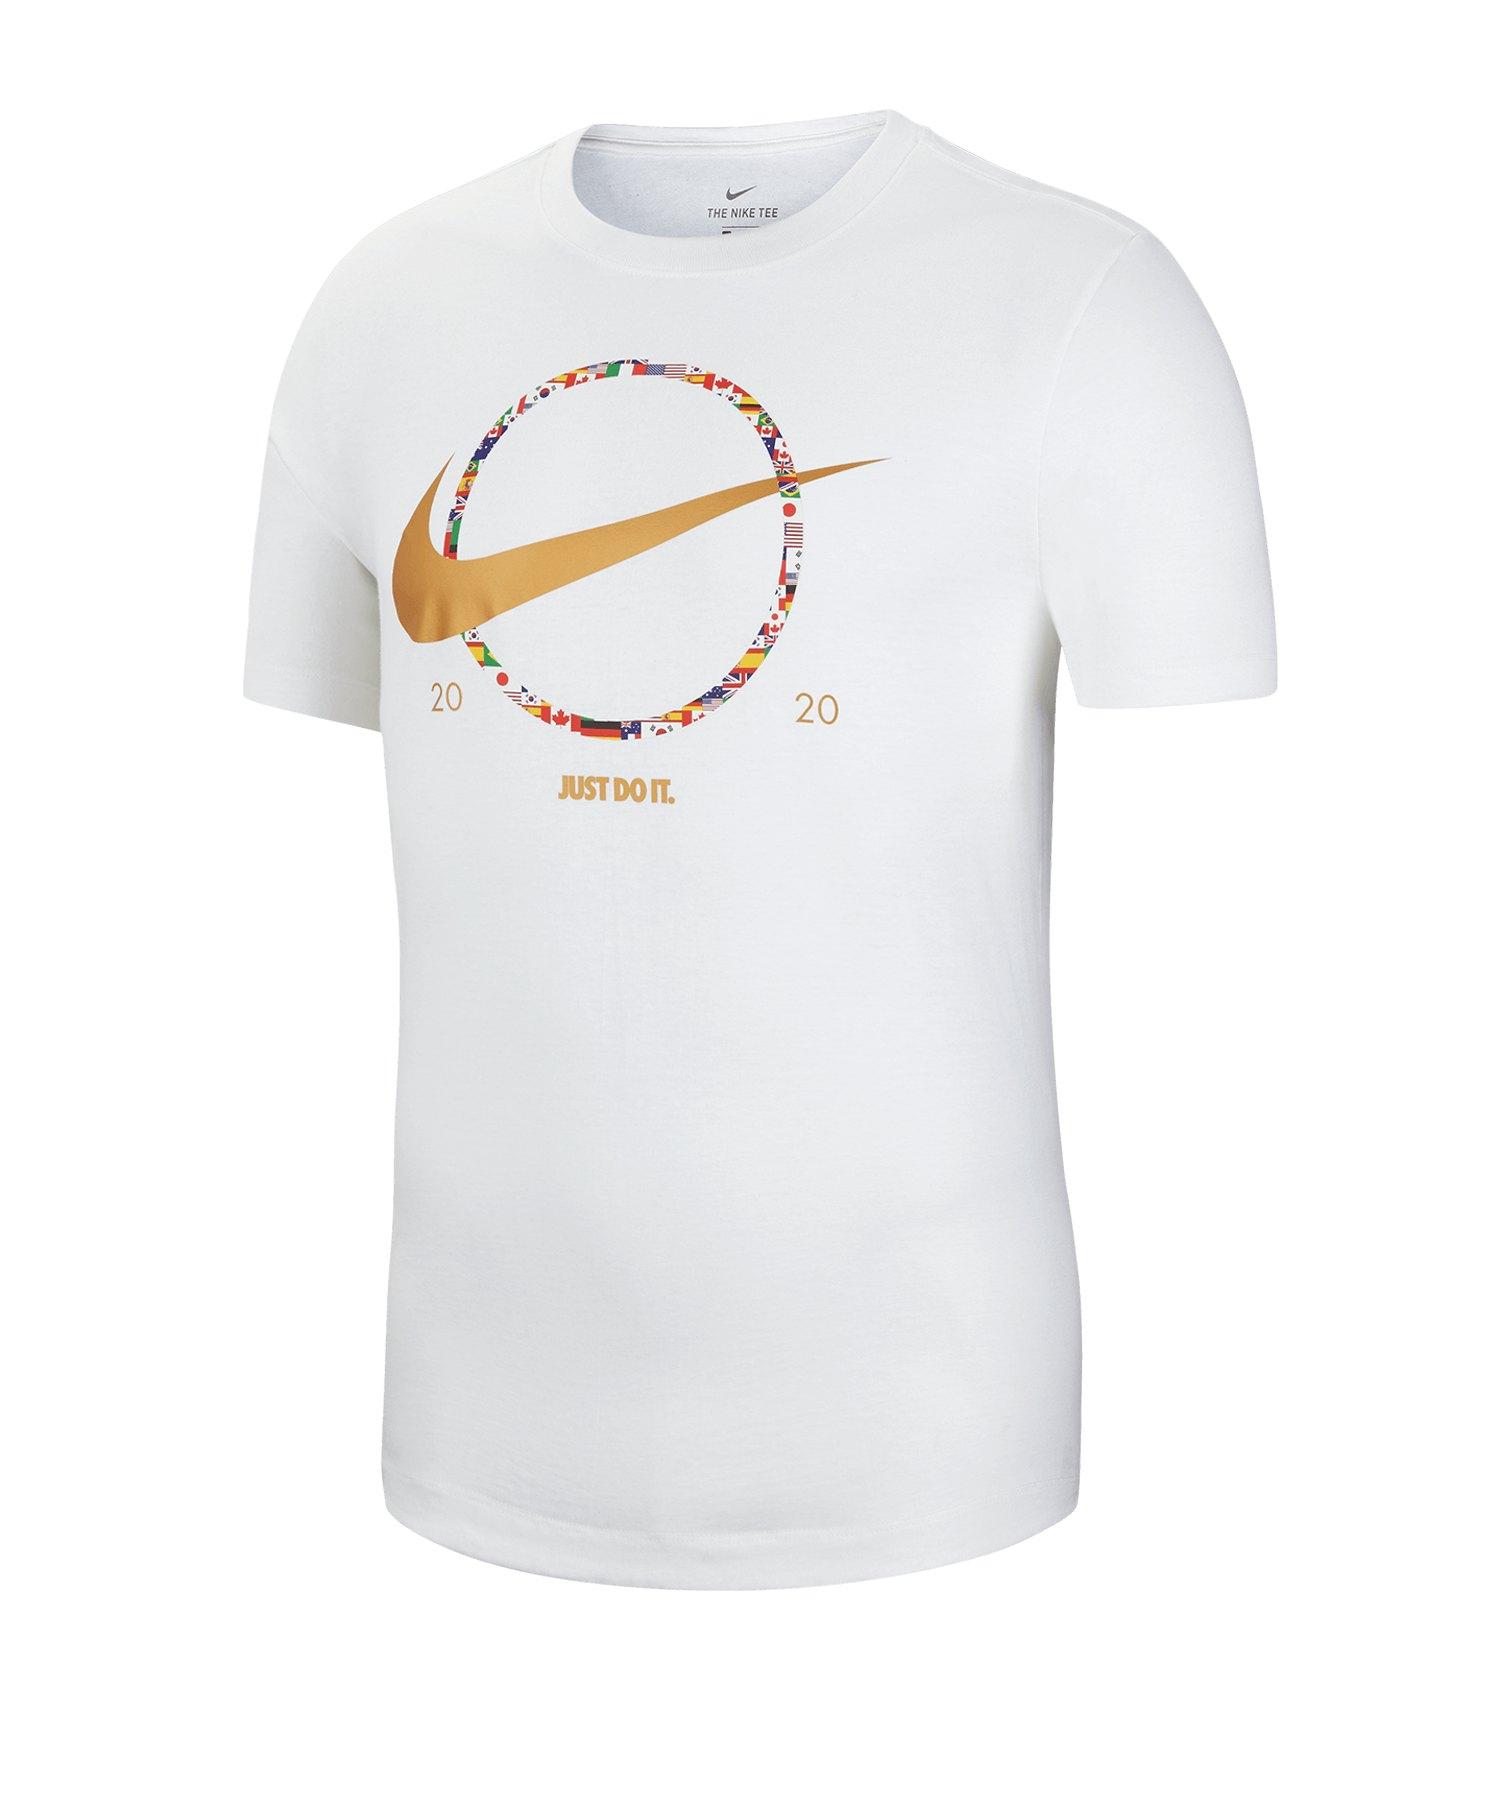 Nike Swoosh Preheat Tee T-Shirt Weiss F100 - weiss